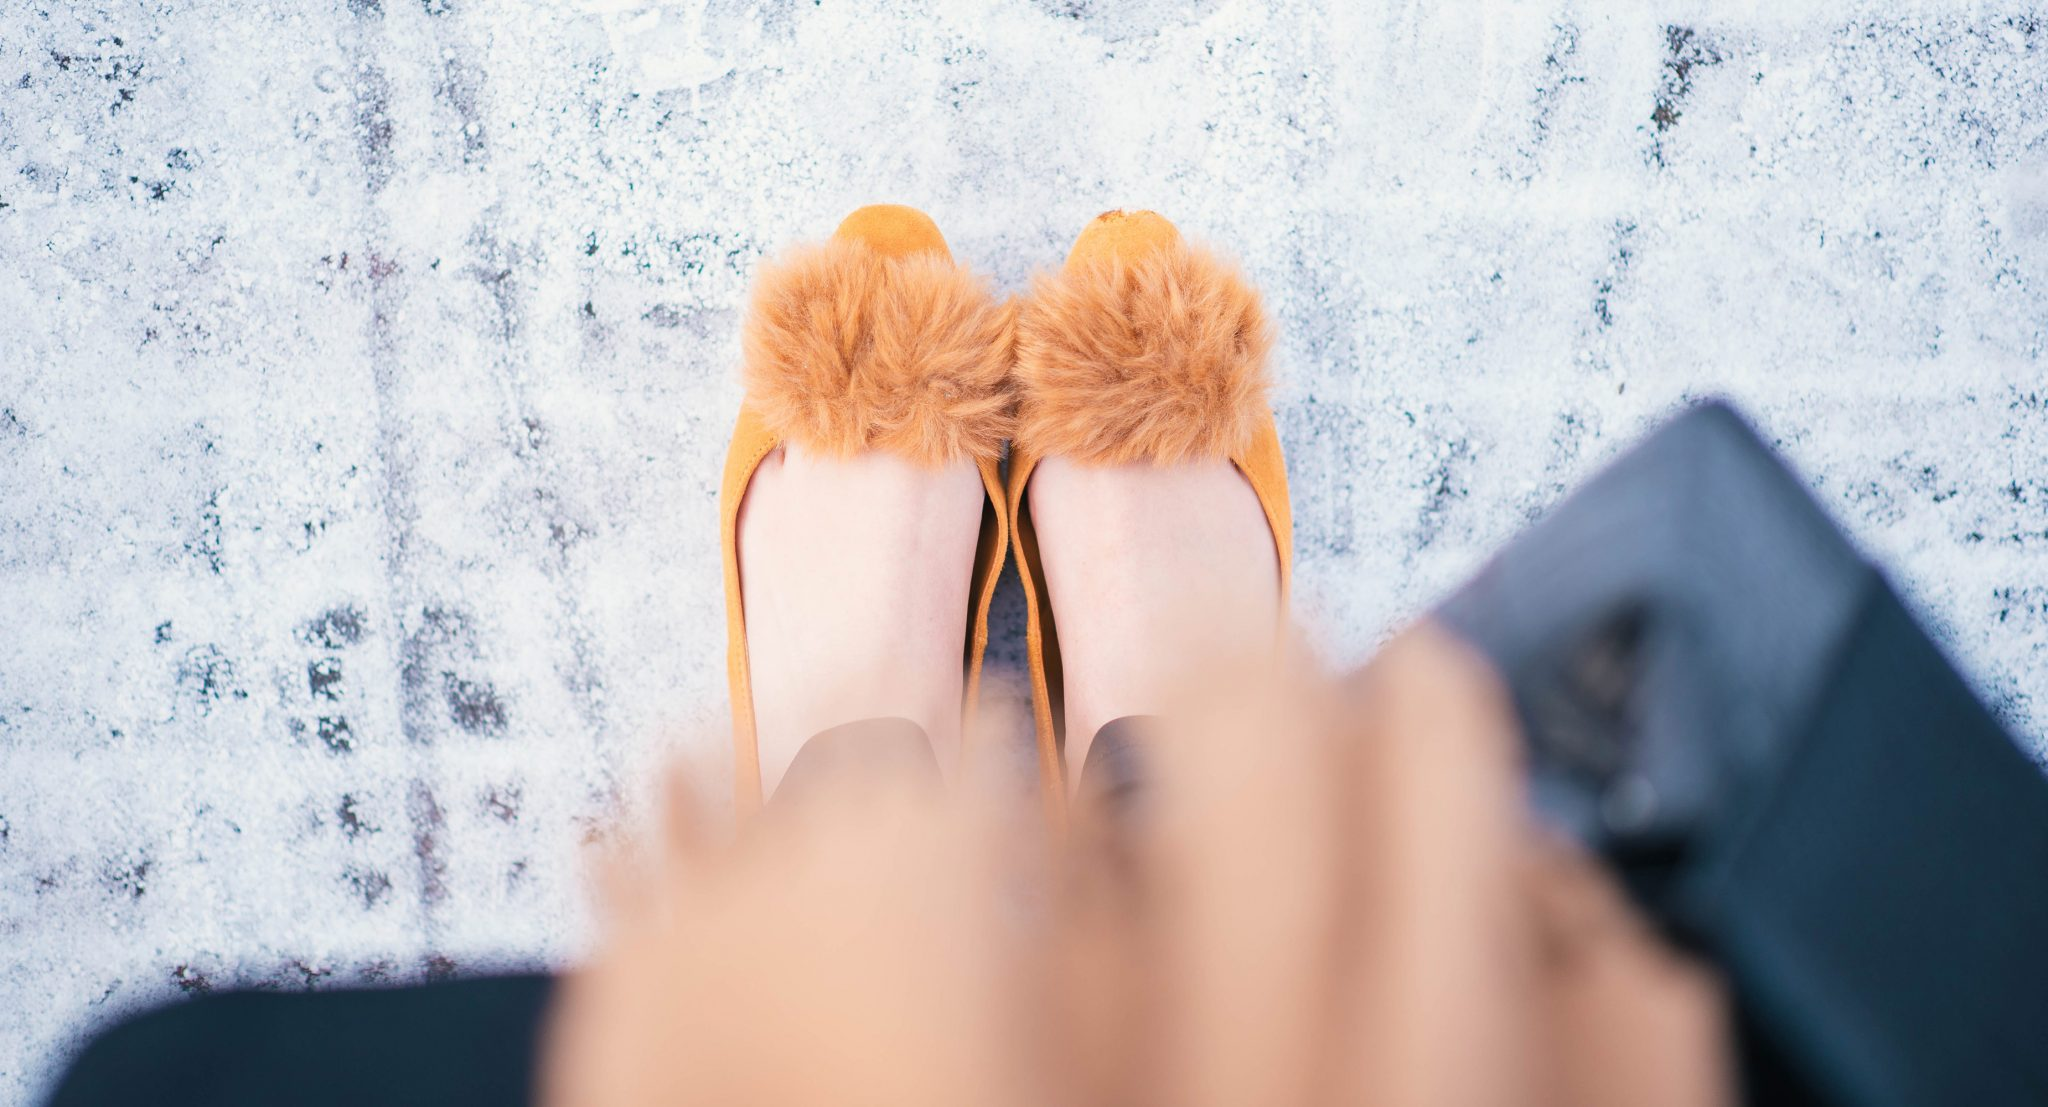 pom-pom-shoes-thepetitecat